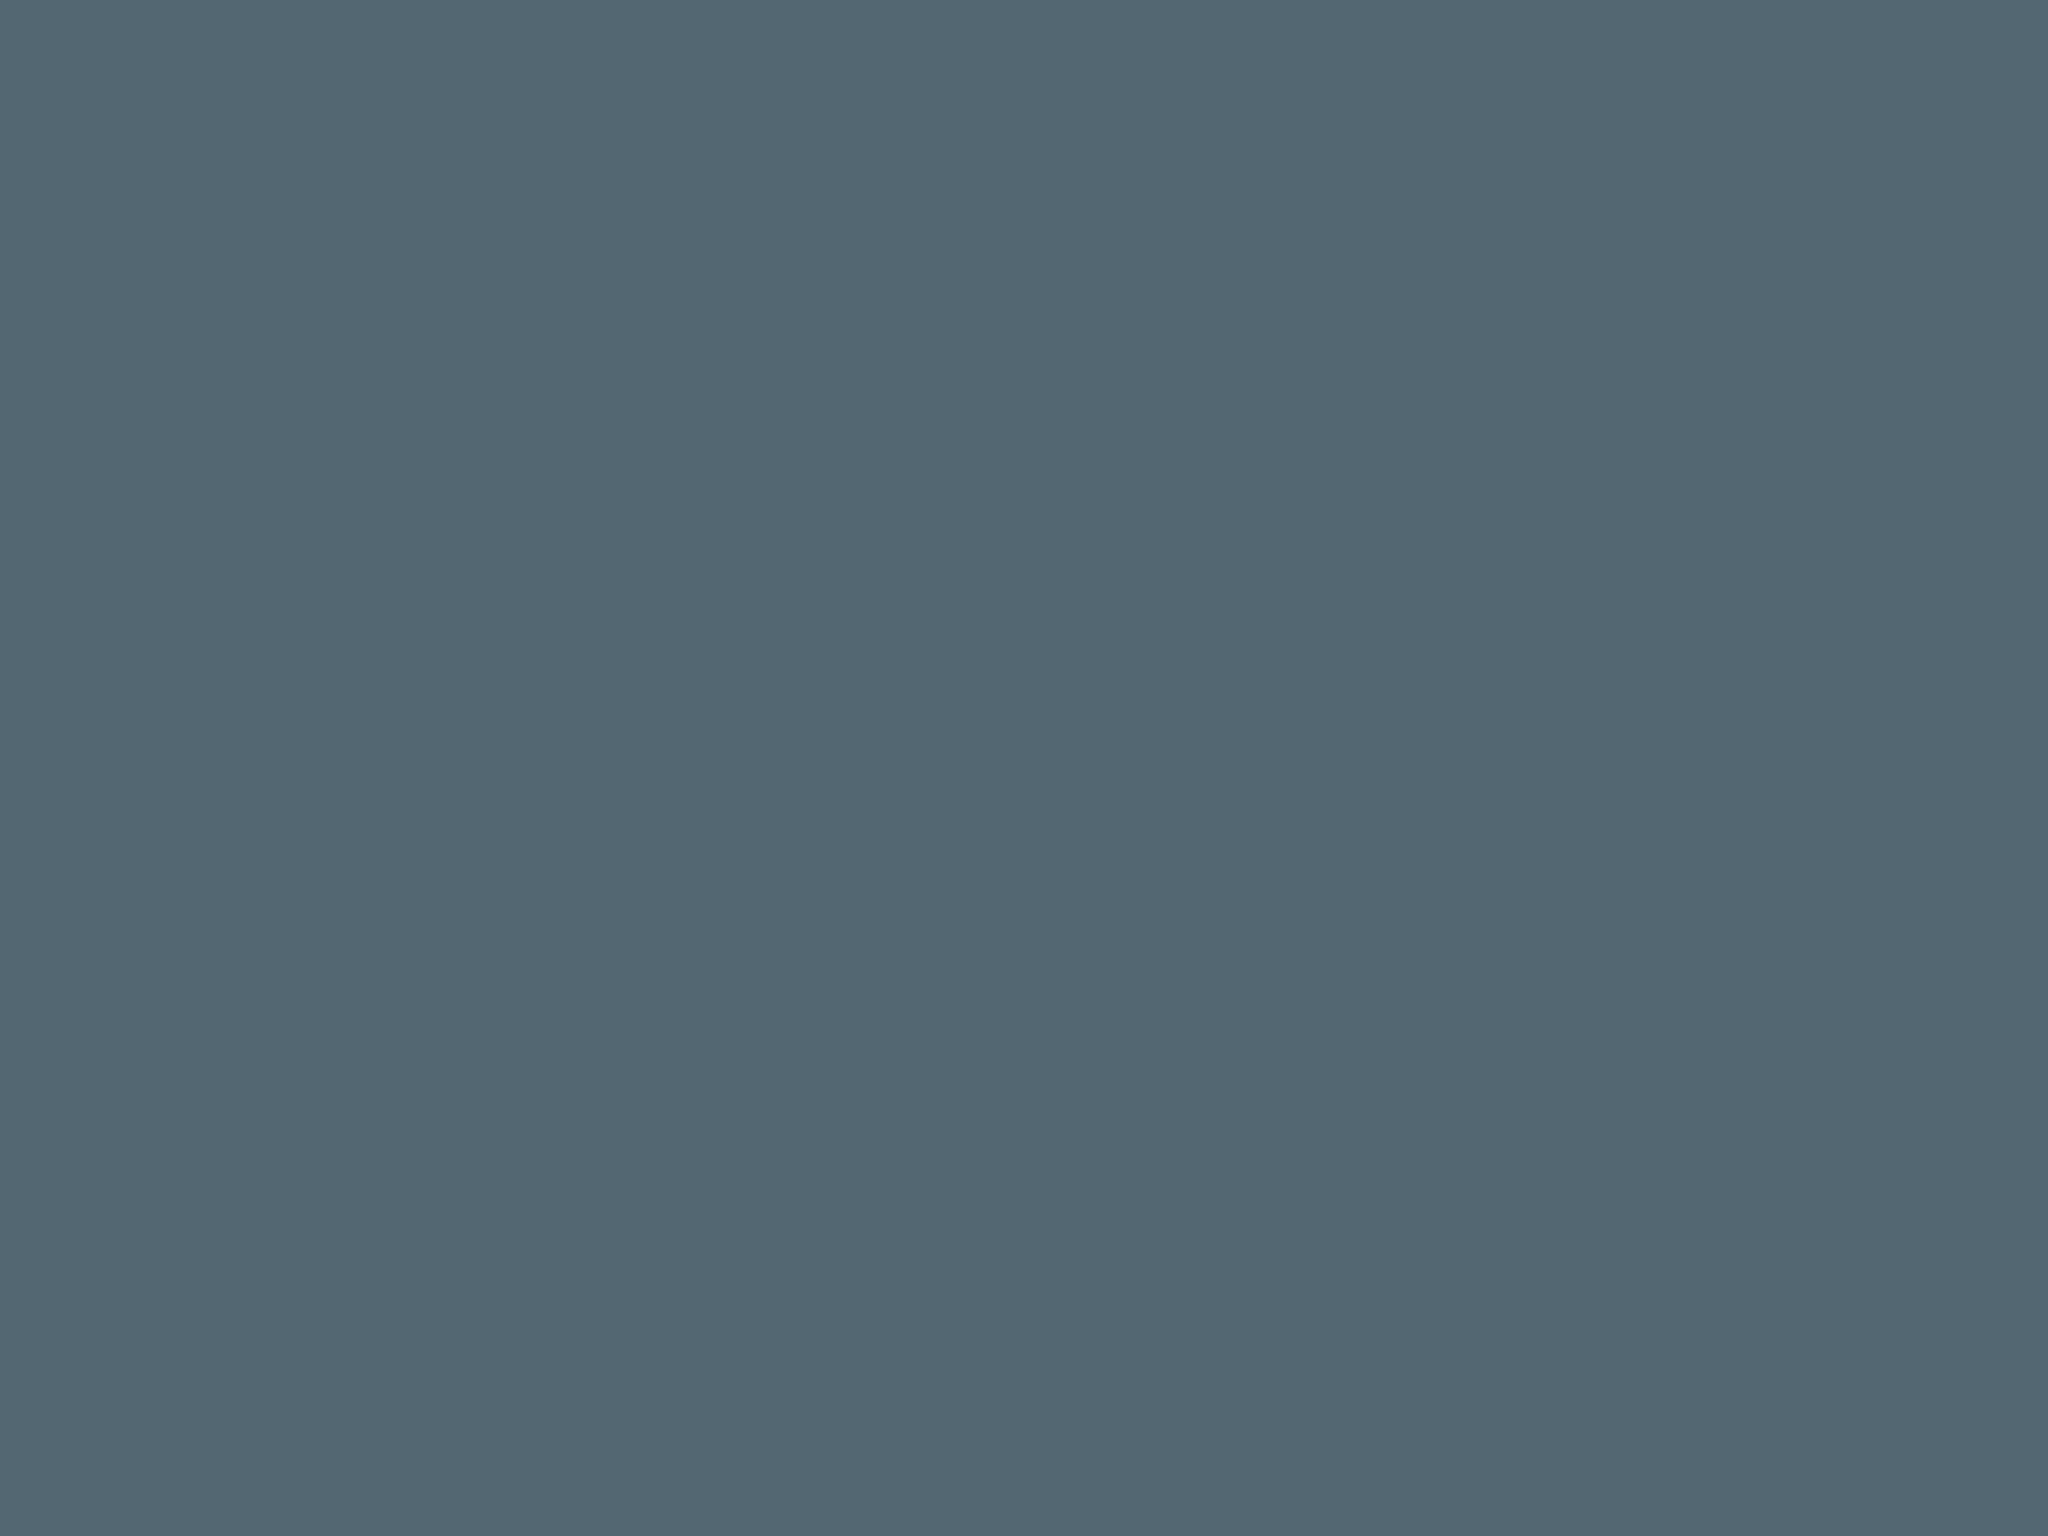 2048x1536 Cadet Solid Color Background